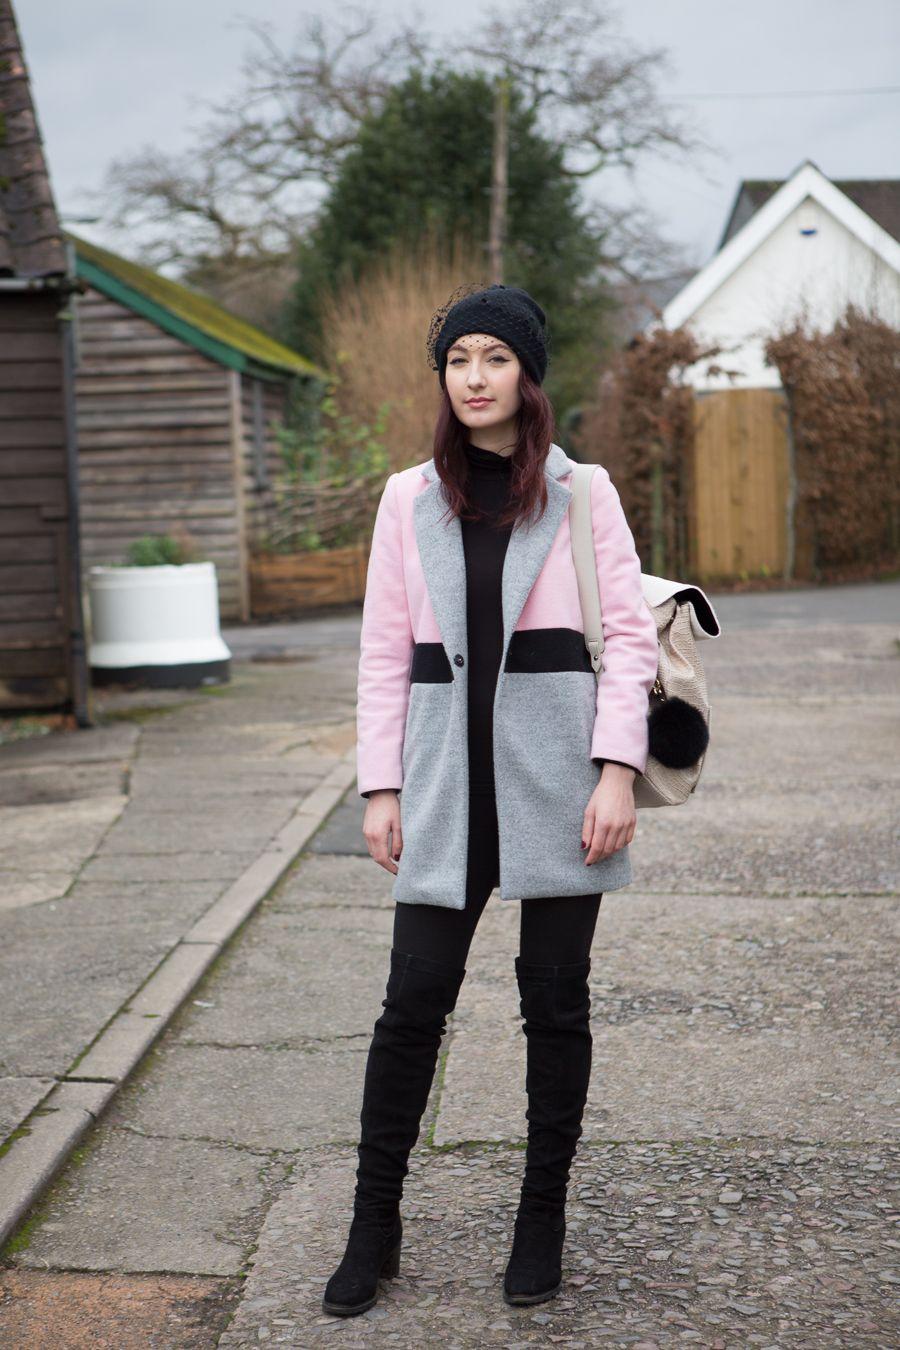 afecd6df Beanie Girl // OOTD from StyleRarebit.com | Style Rarebit | Girl ...